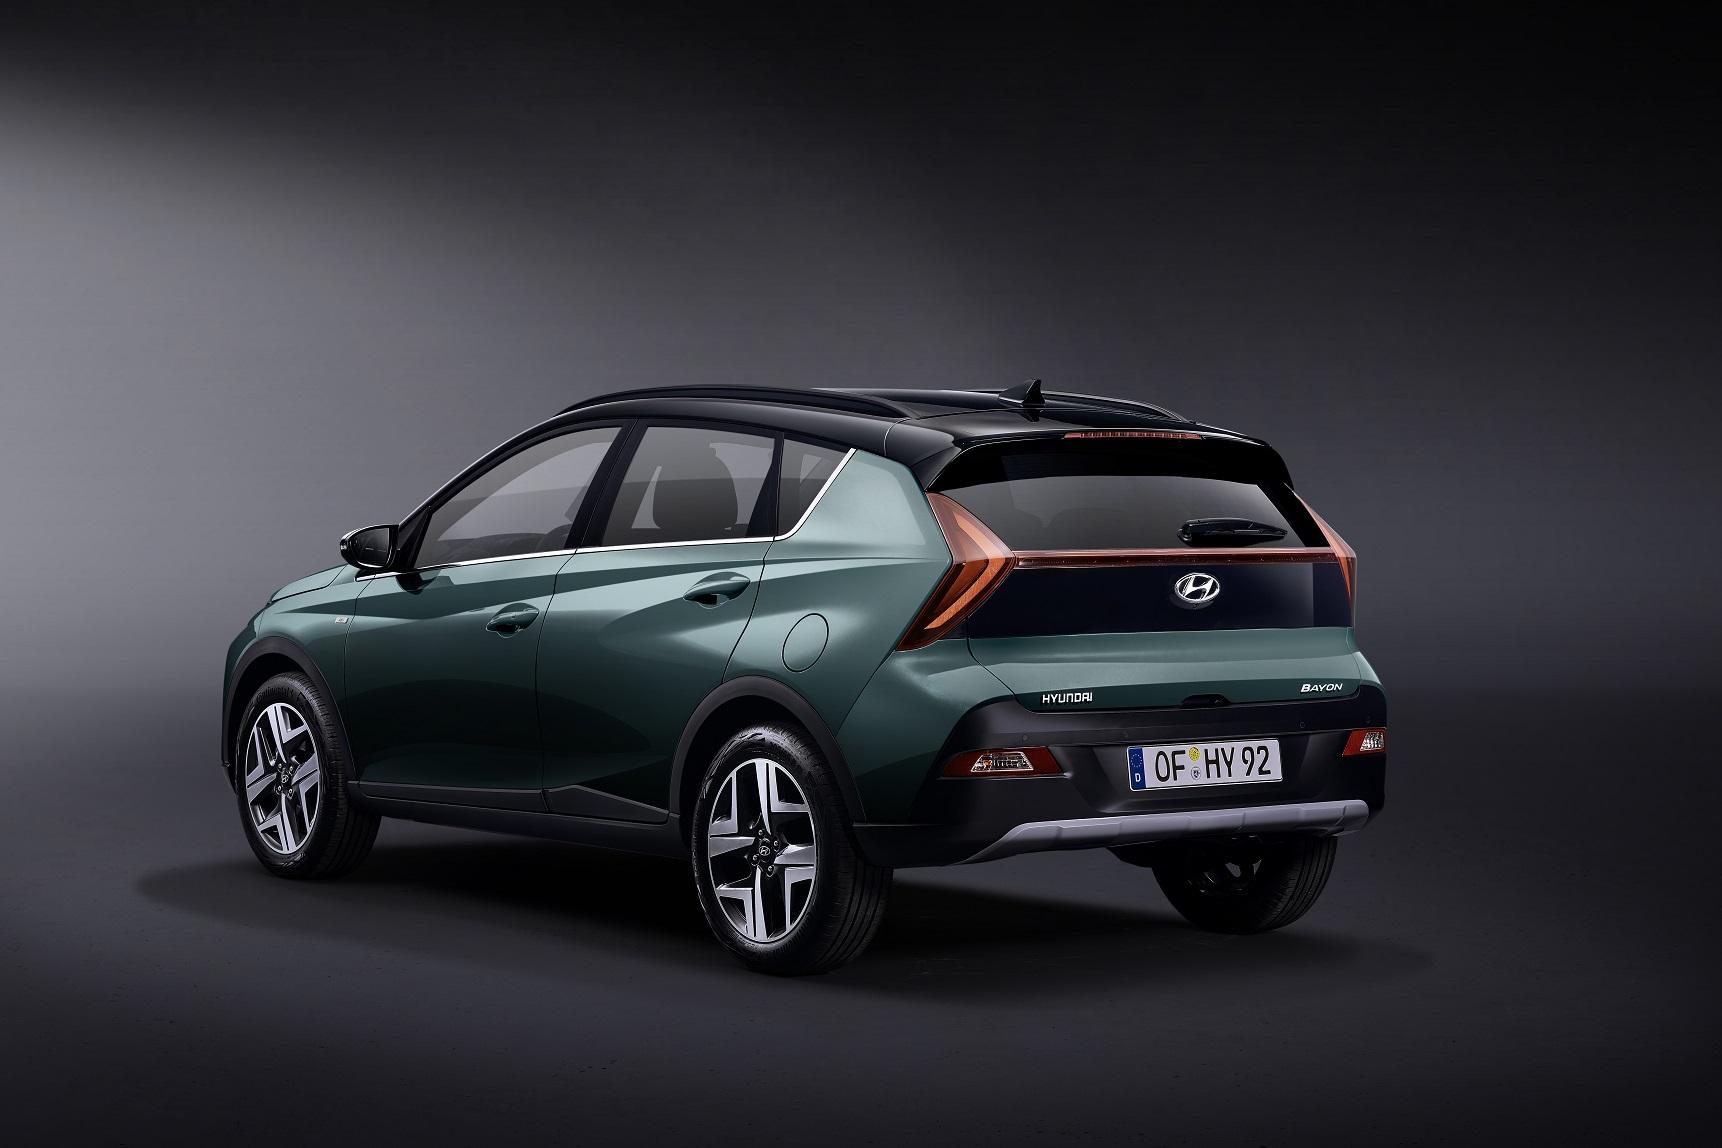 Nuova Hyundai BAYON 01